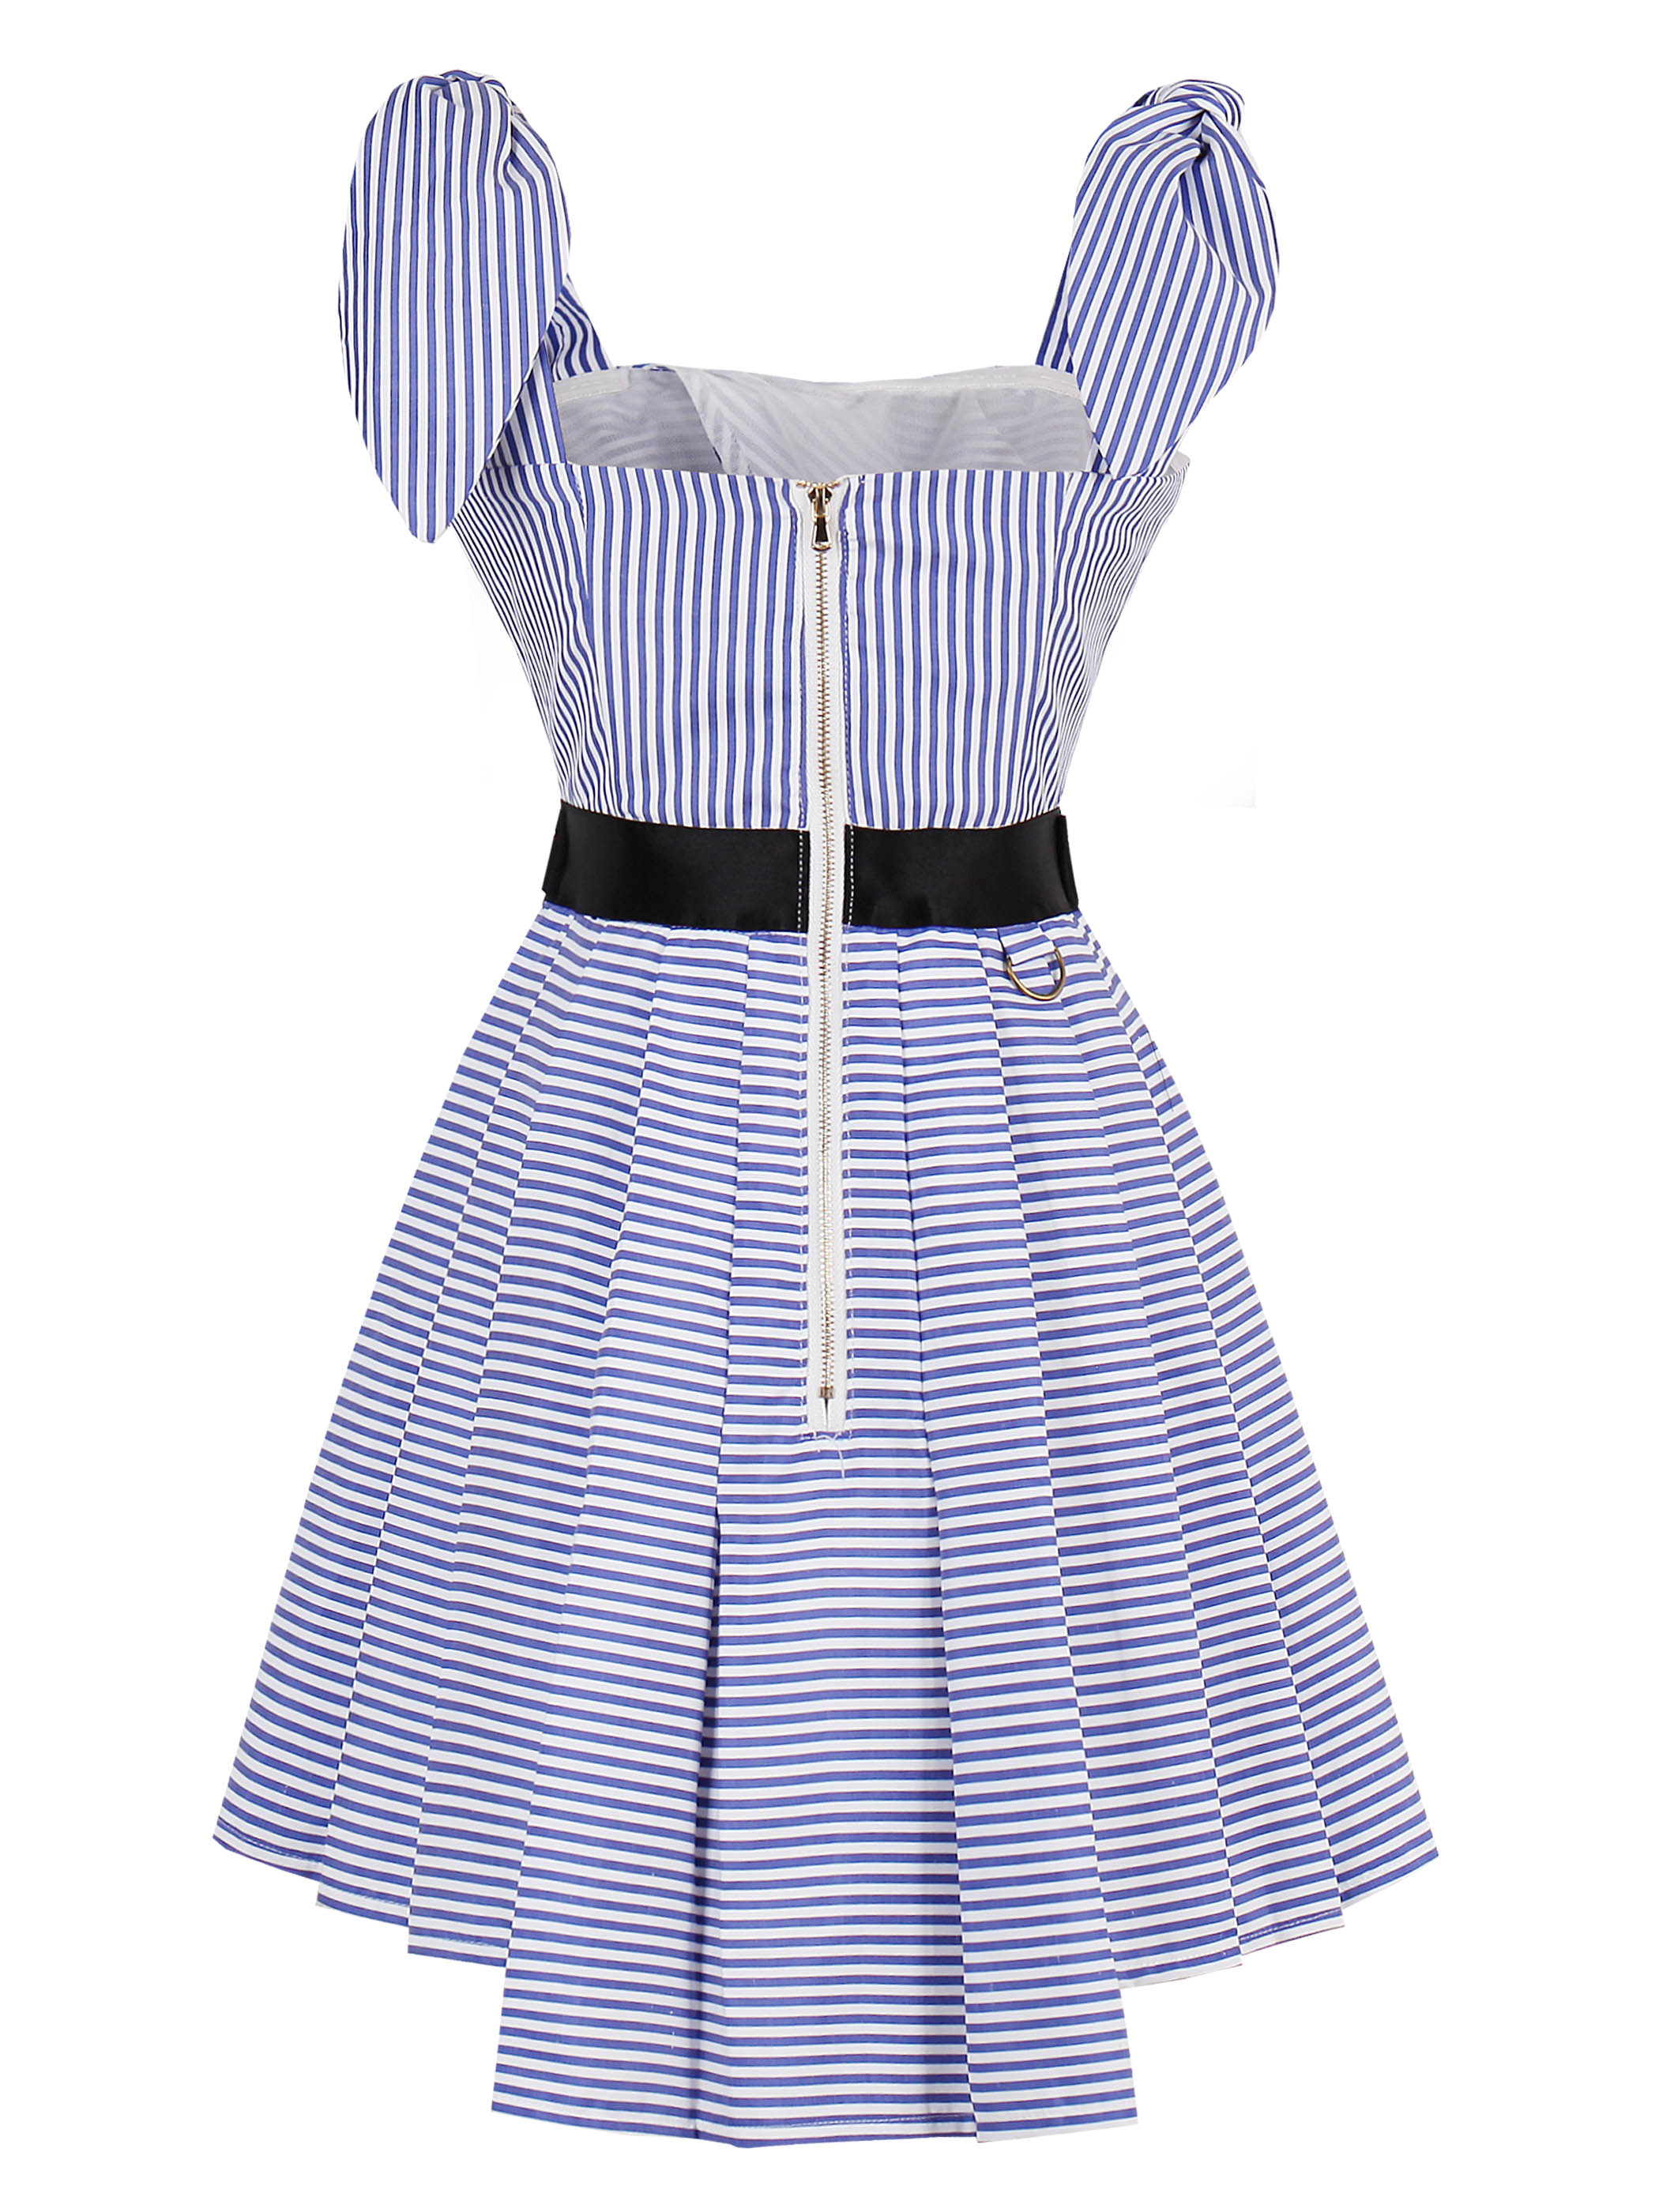 Women A-line Blue Stripe Dress Off Shoulder Belt European Style Sexy Dress Lady Bow Sweater Fashion Summer Mini Dress